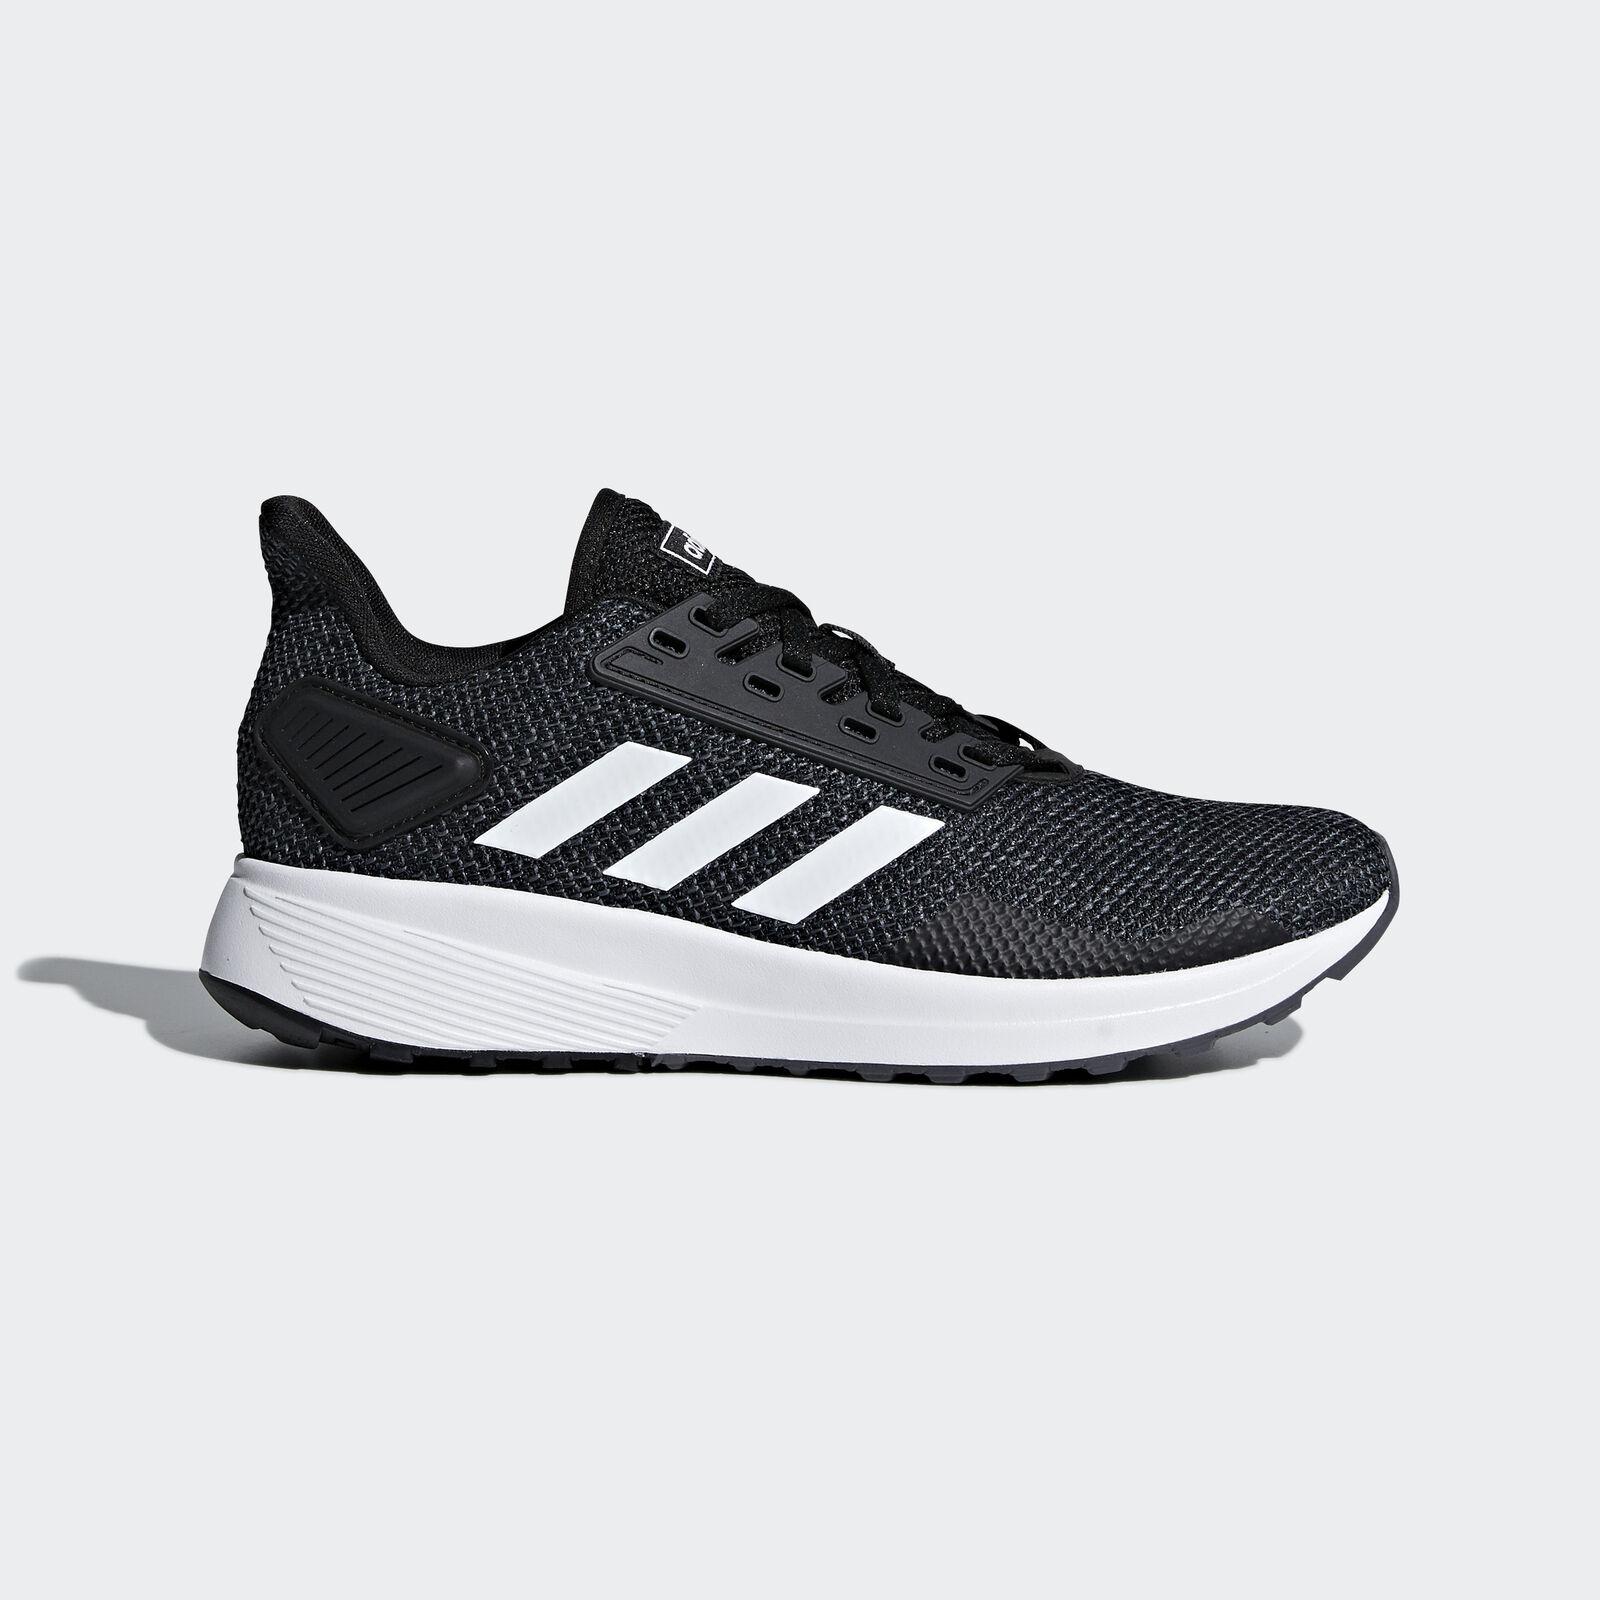 Adidas AU Women Core Black Duramo 9 Shoes